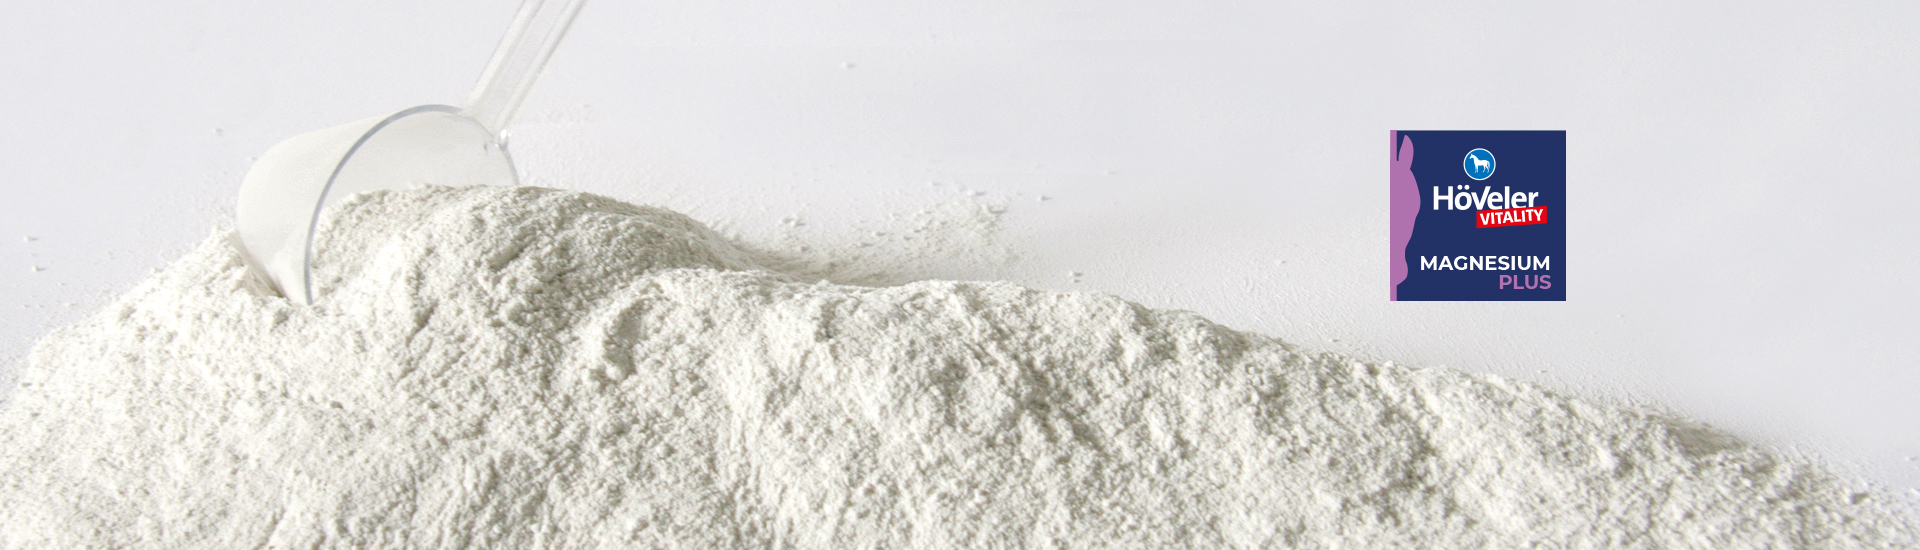 hoeveler-vitality-magnesium-plus